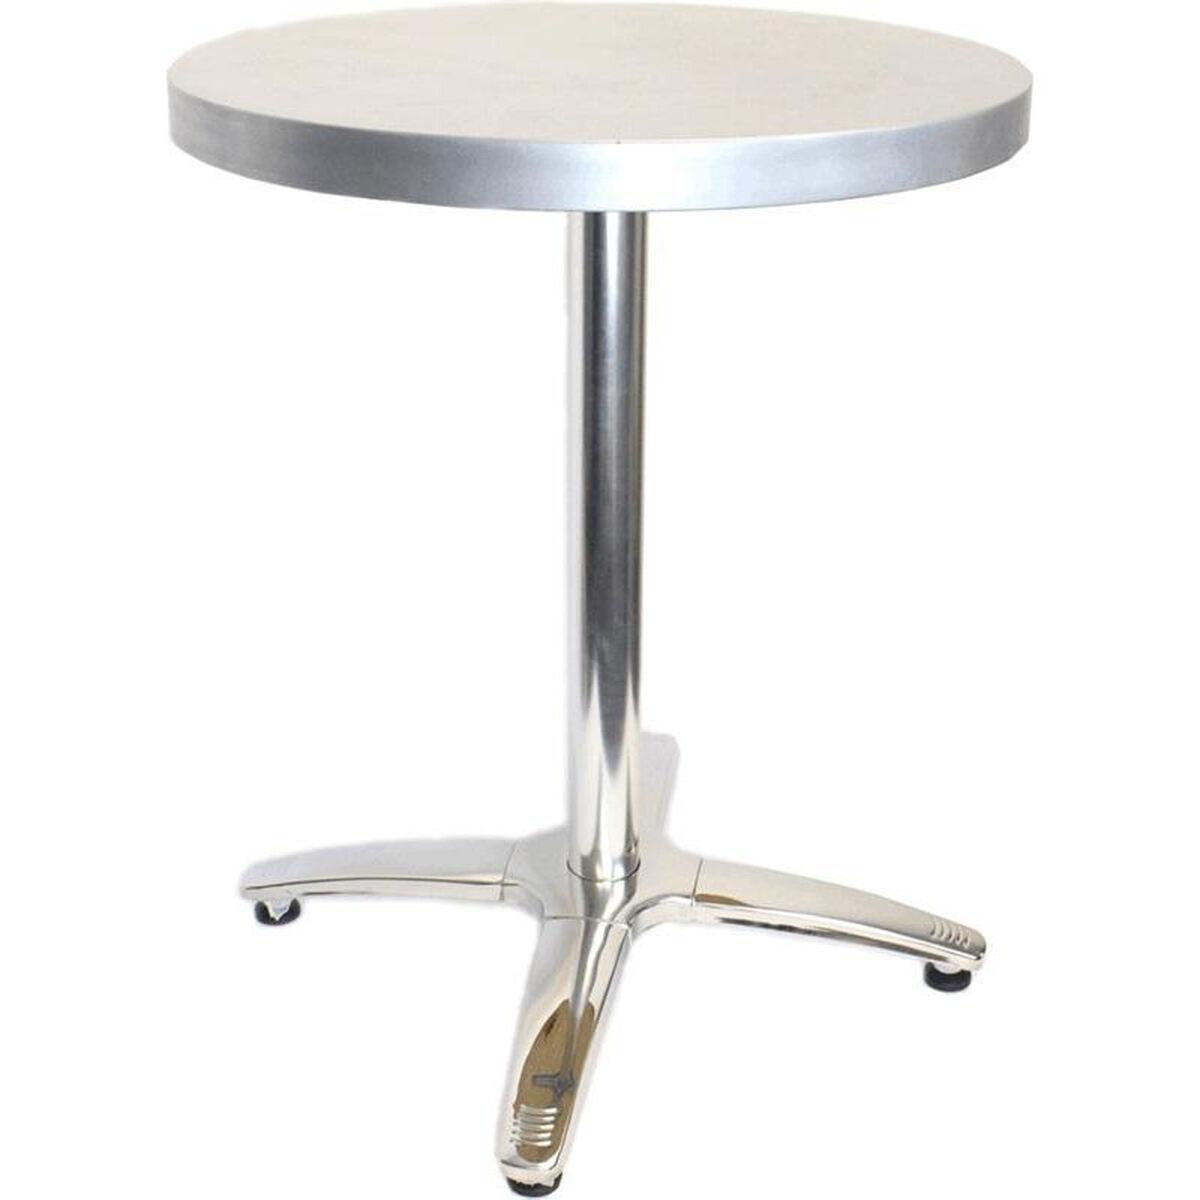 Round Zinc Cafe Table JC RestaurantFurnitureLesscom - Round metal cafe table